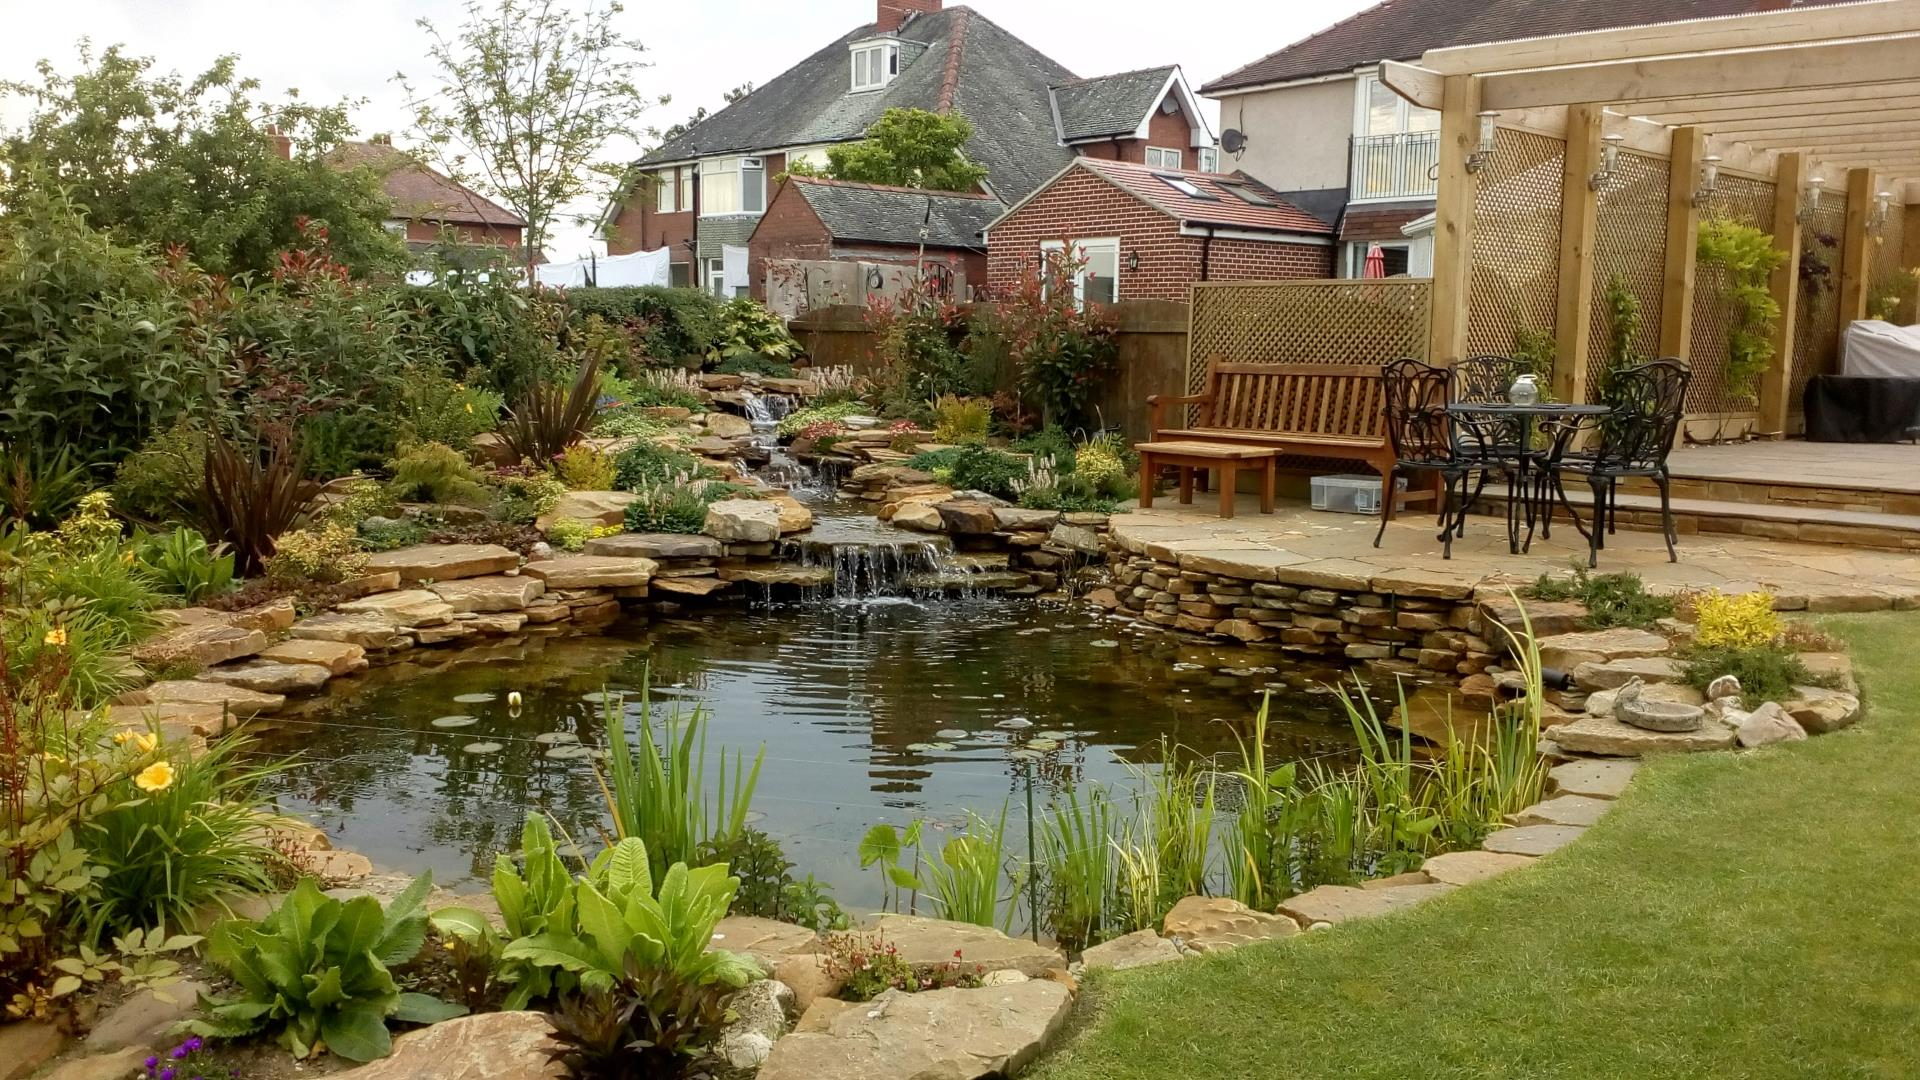 Home - Gardens Transformed - Garden and Landscape Design in Carlisle ...